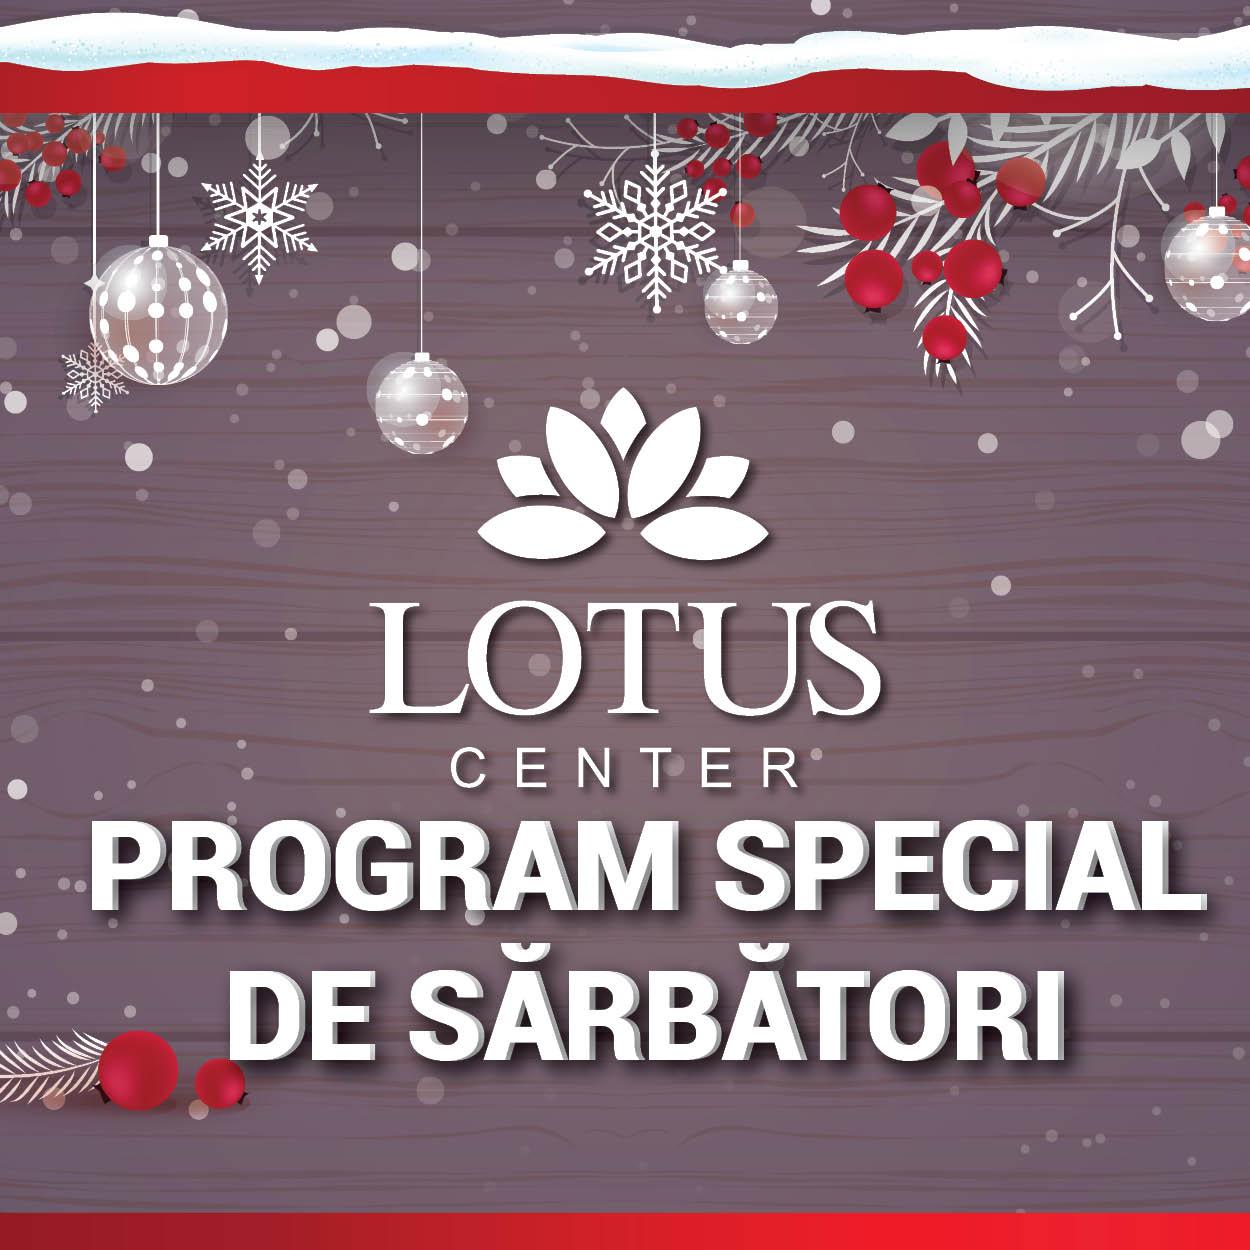 300x300 px program de sarbatori Lotus Center2